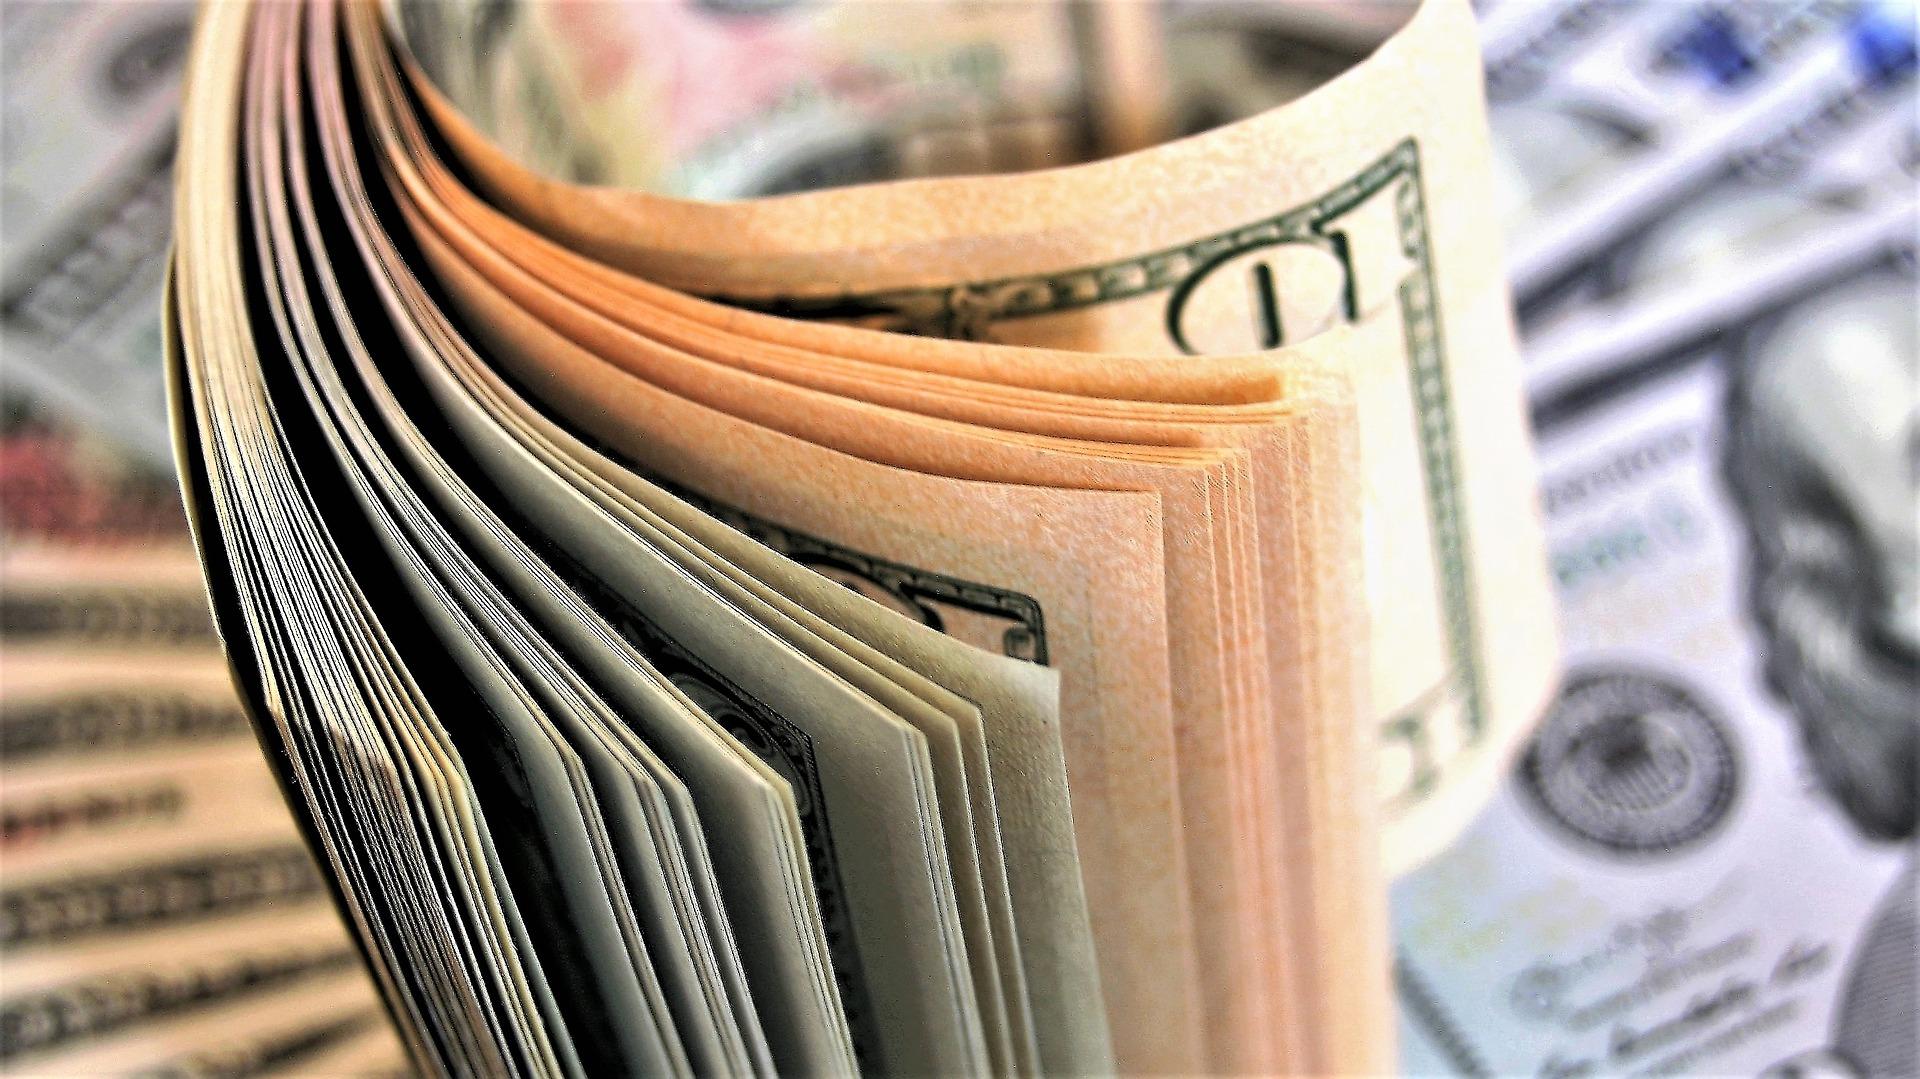 Доллар США вырос на новостях о новом штамме COVID-19